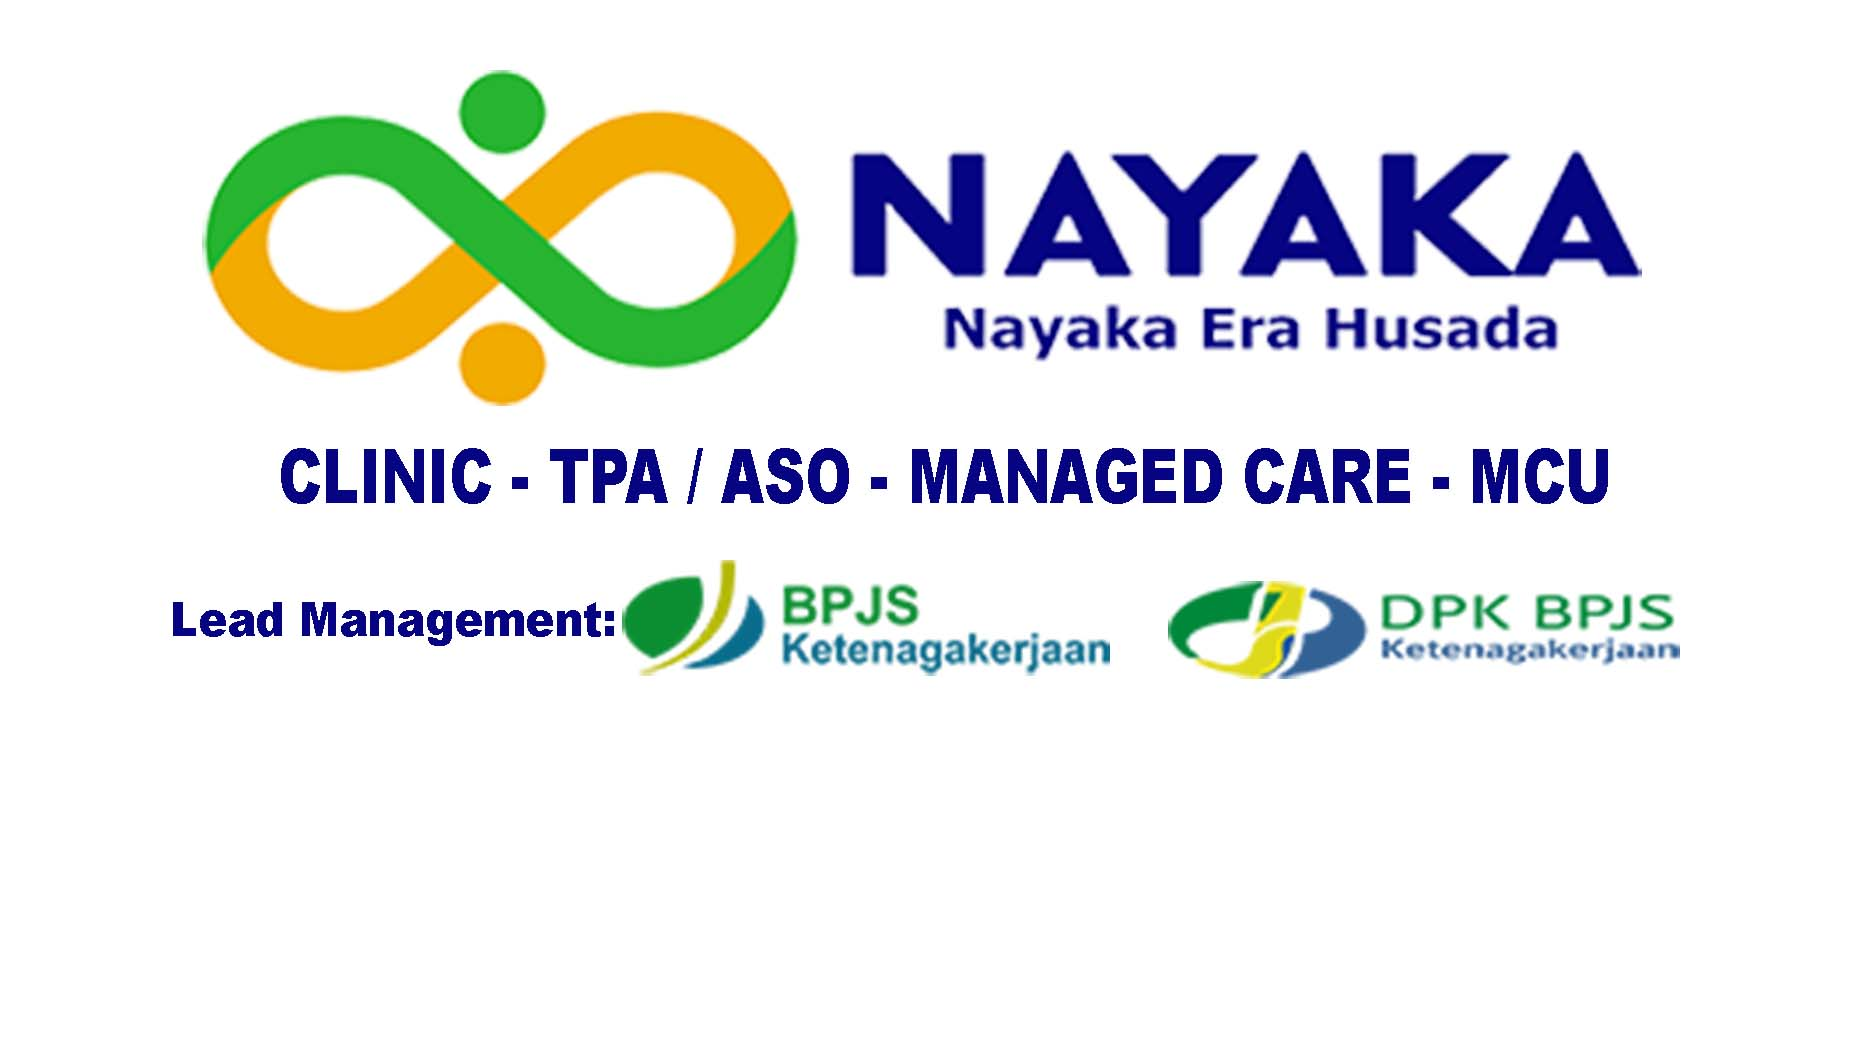 20210118062610_logo_presentation5_copy.jpg